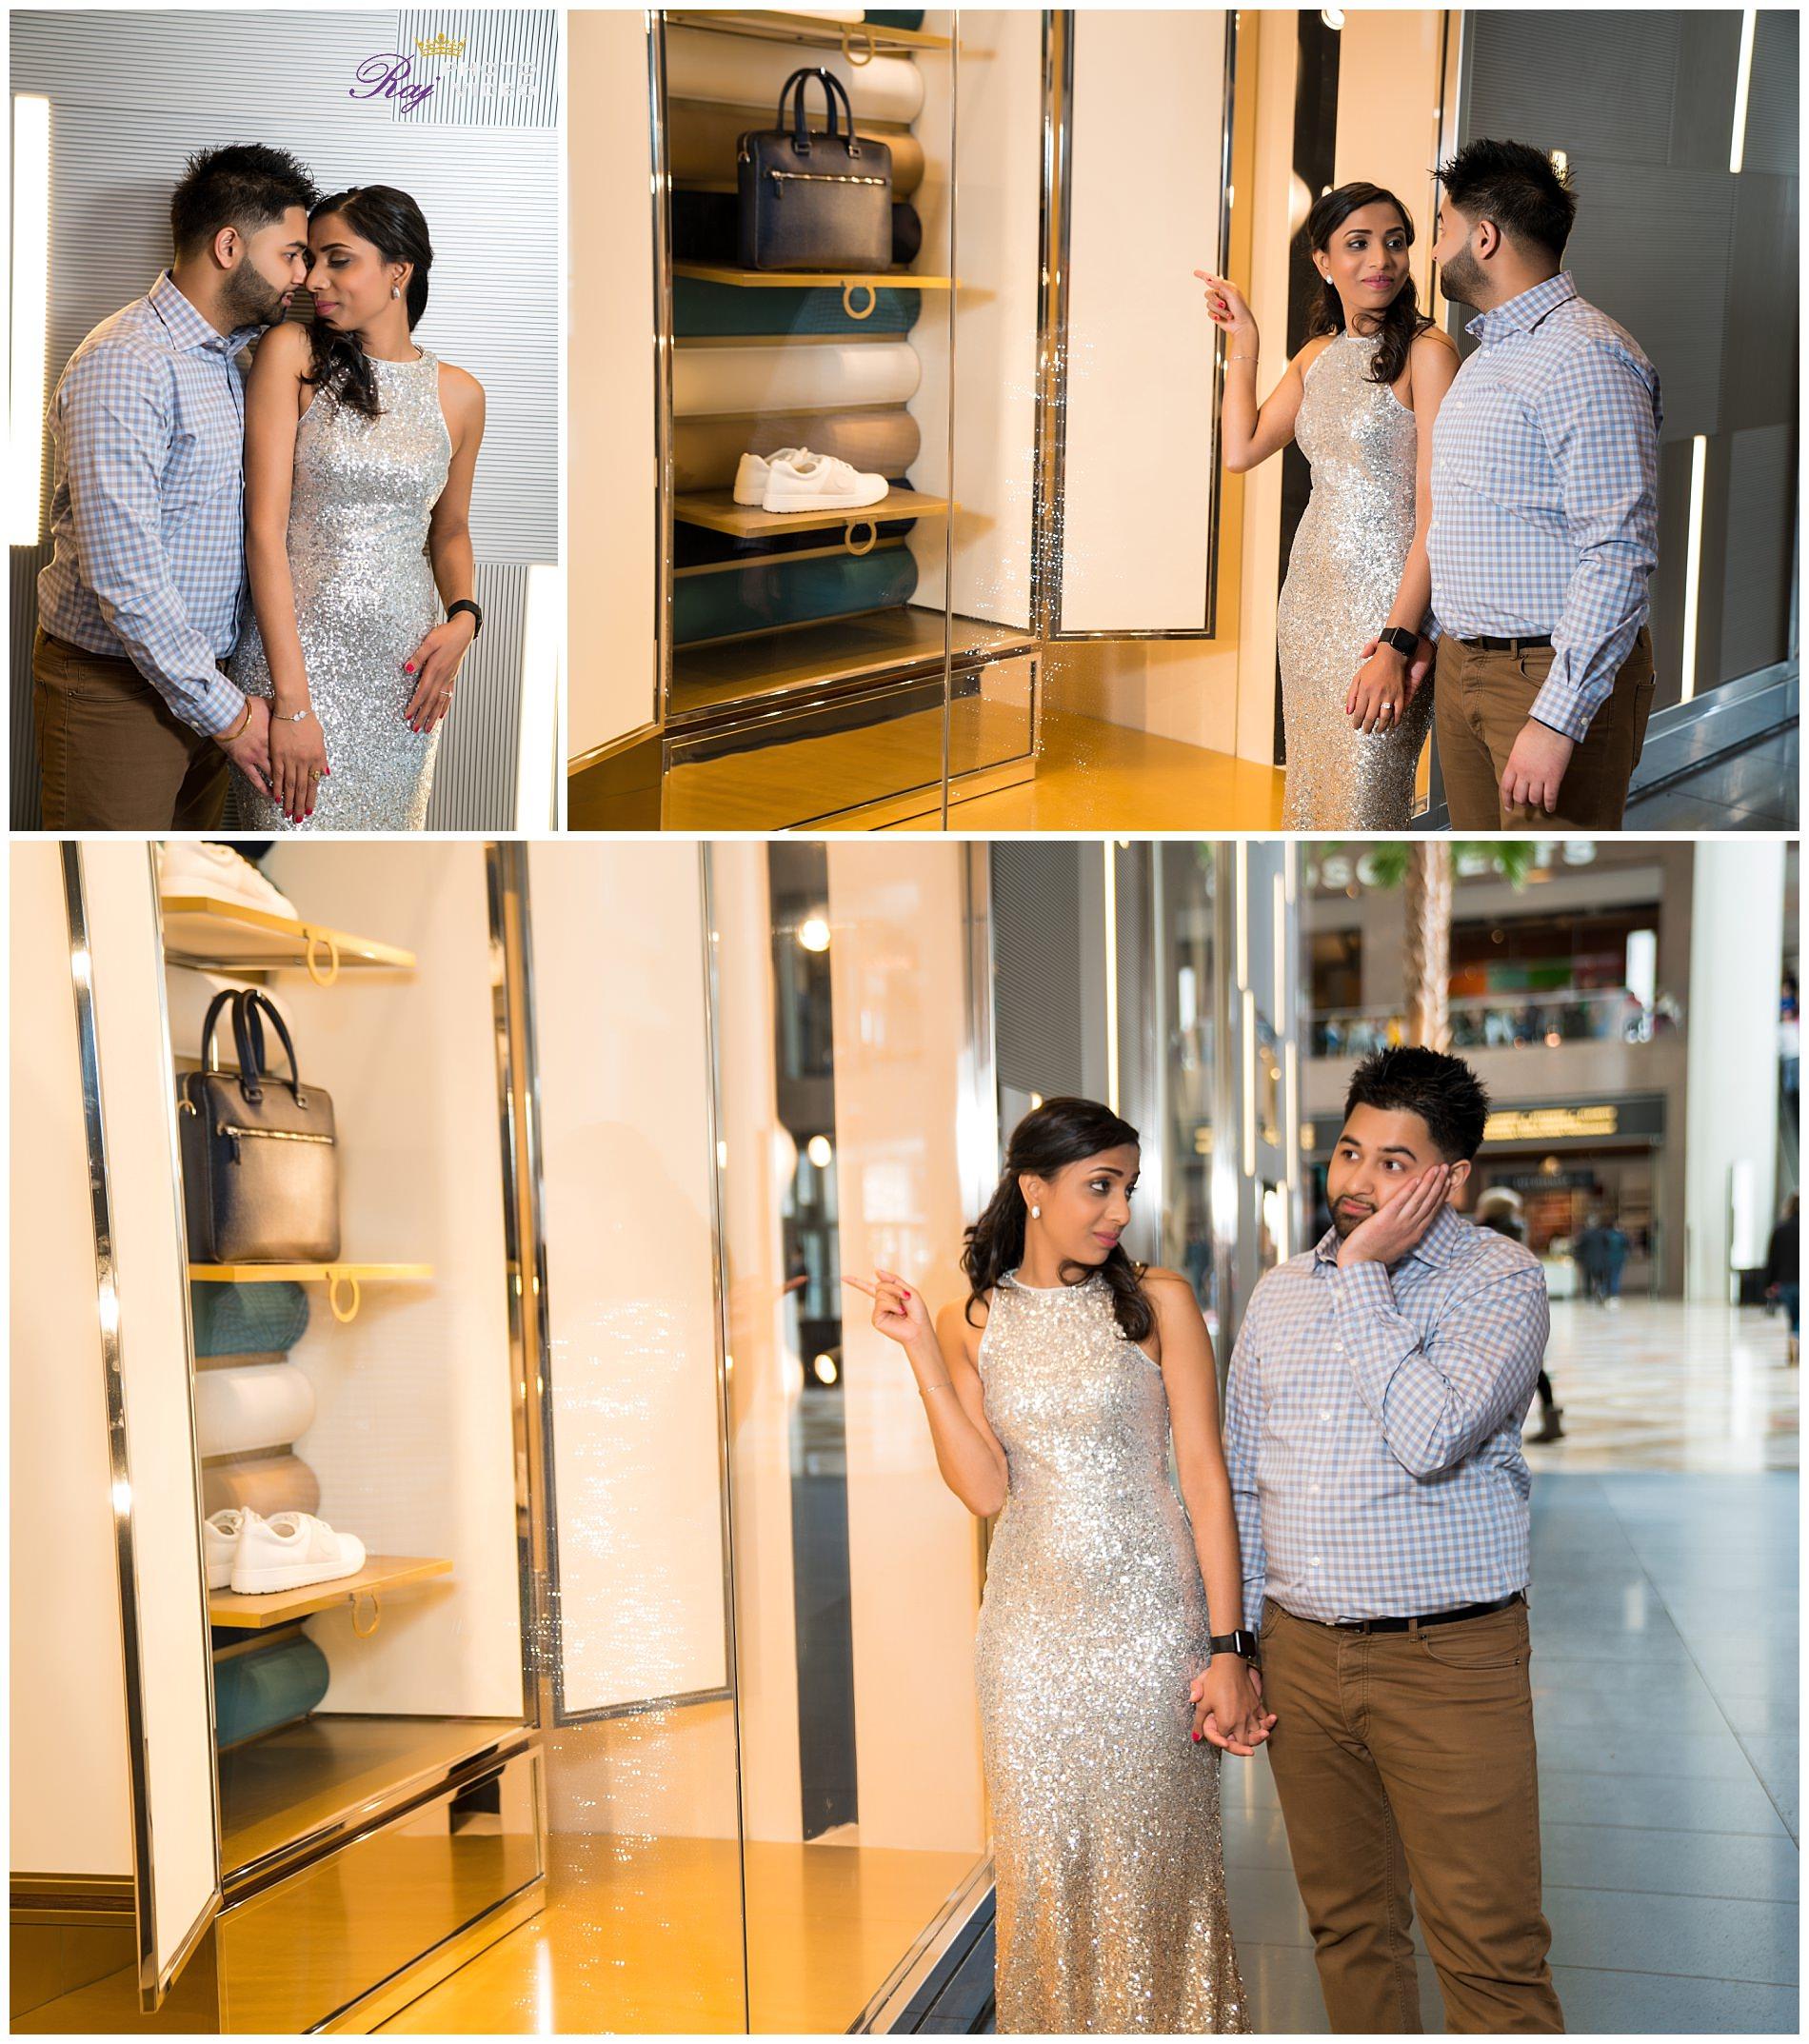 The-Oculus-Brookfield-Place-Downtown-Manhattan-Engagement-Shoot-Nidhi-Rudra-00014.jpg